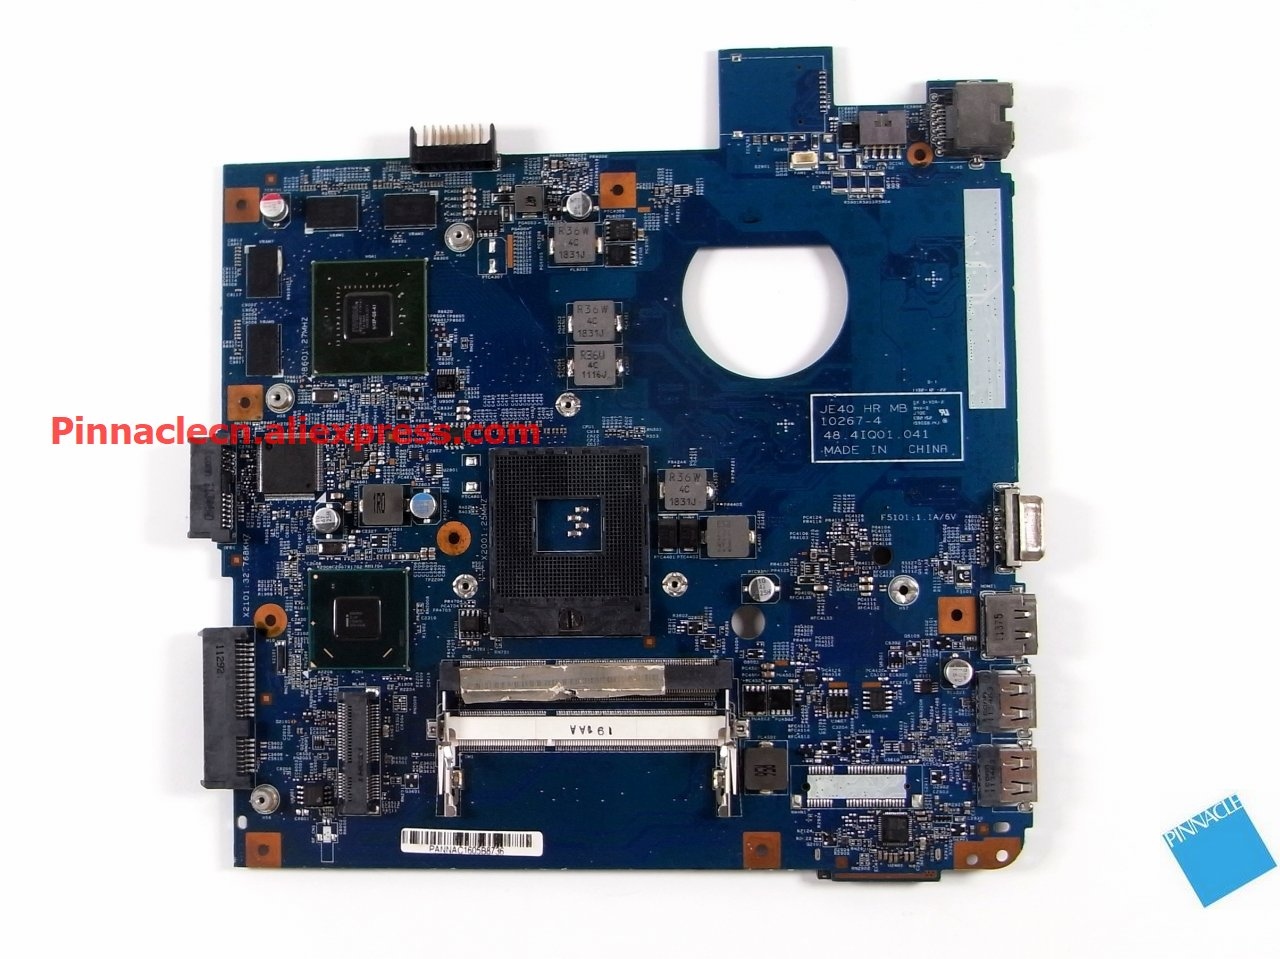 MBRRB01001 Motherboard for Acer  Aspire 4752G 4755G JE40 48.4IQ01.041MBRRB01001 Motherboard for Acer  Aspire 4752G 4755G JE40 48.4IQ01.041